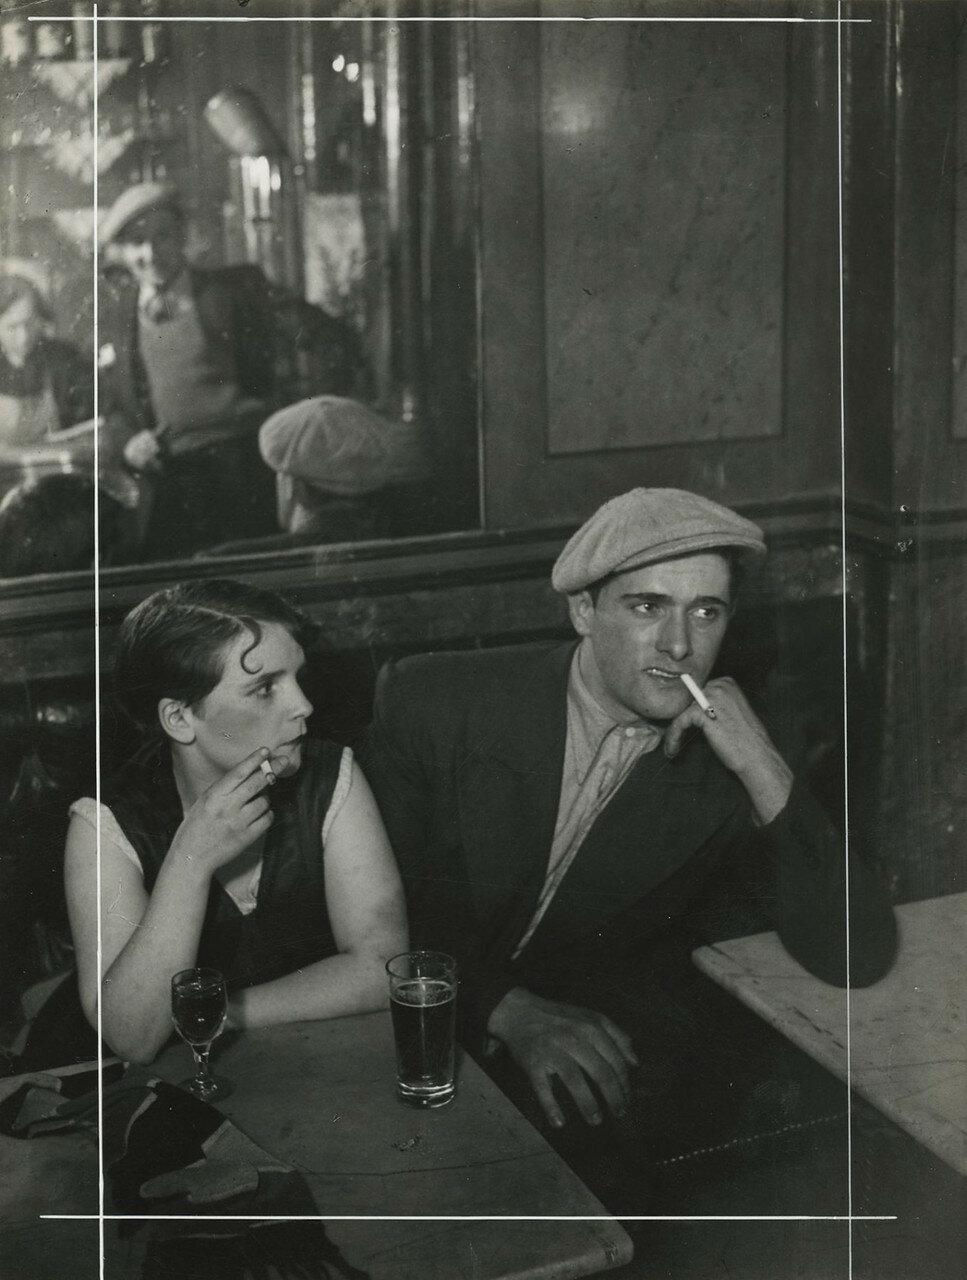 1930. Влюбленная парочка в бистро на улице Сен-Дени